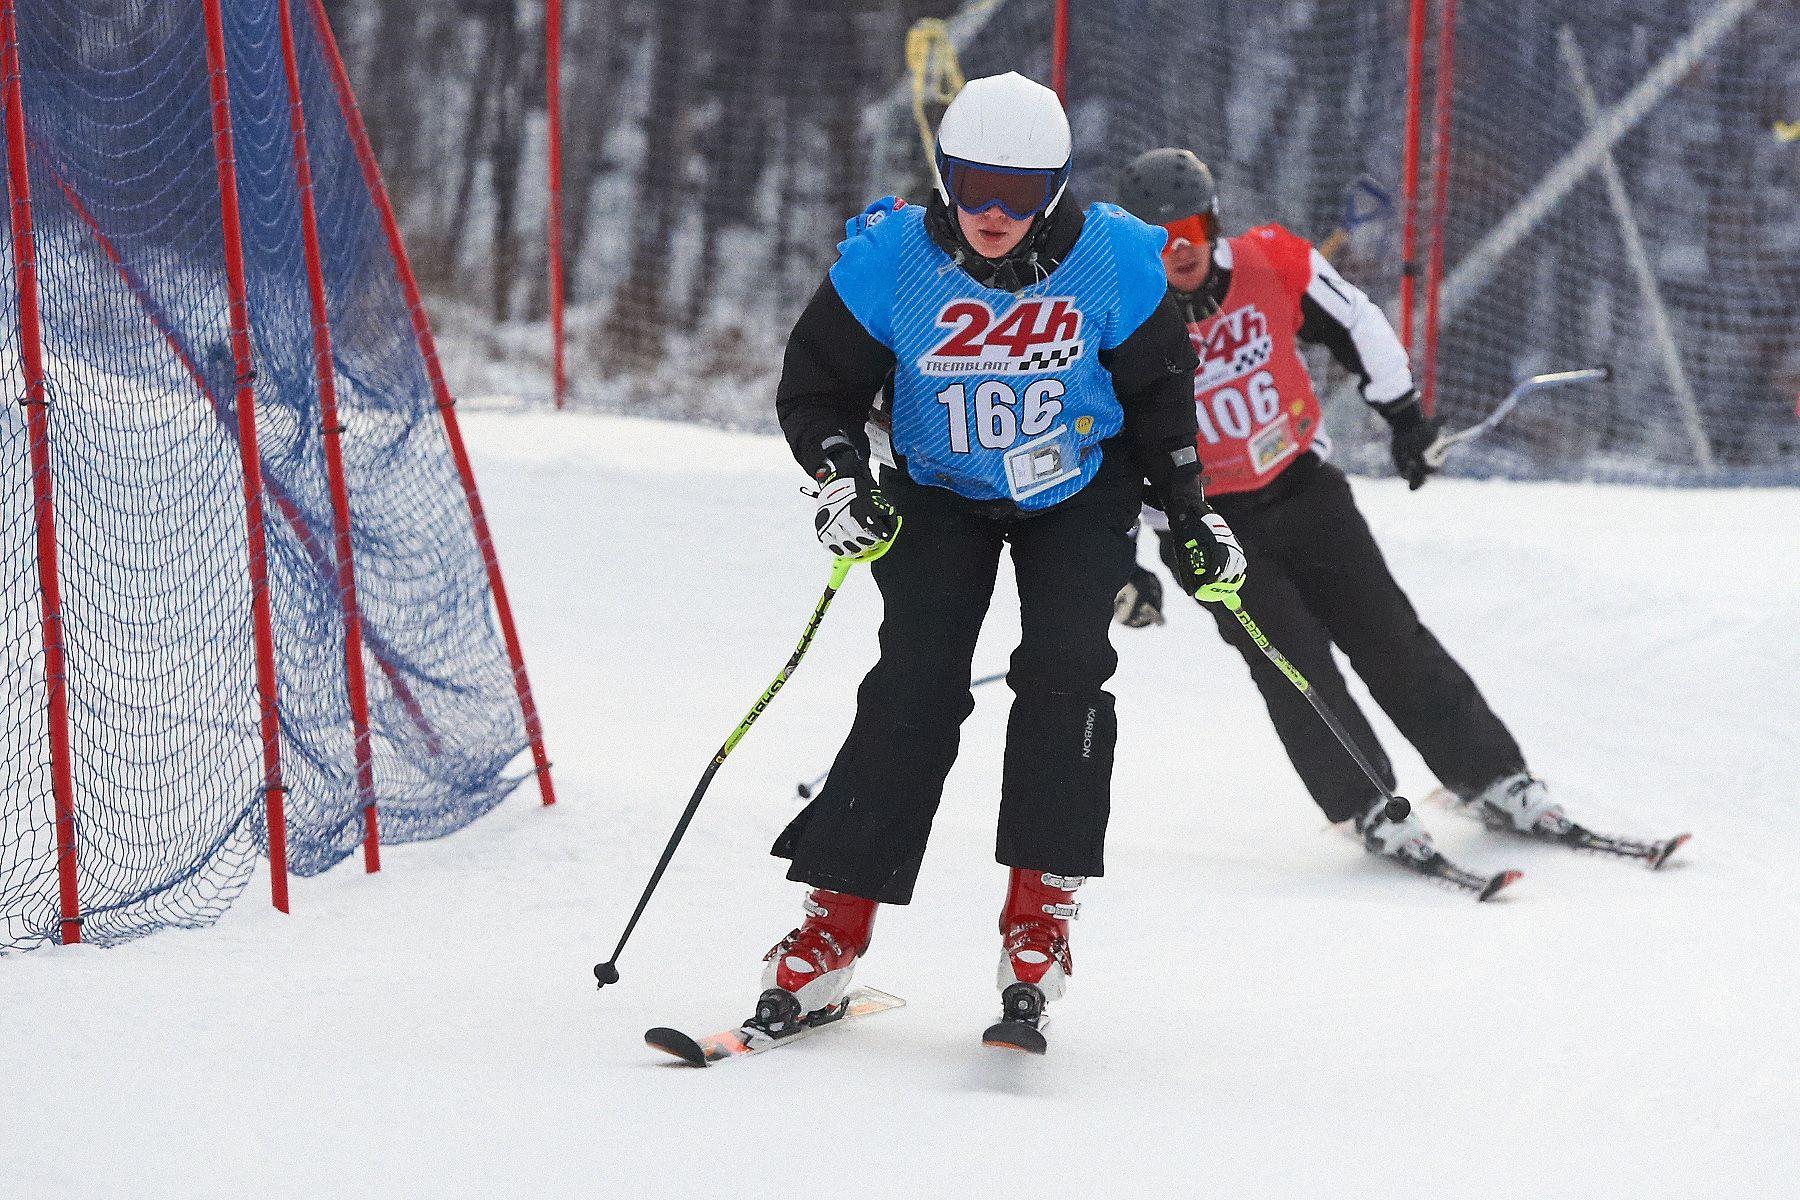 Skating-to-the-finish.jpg